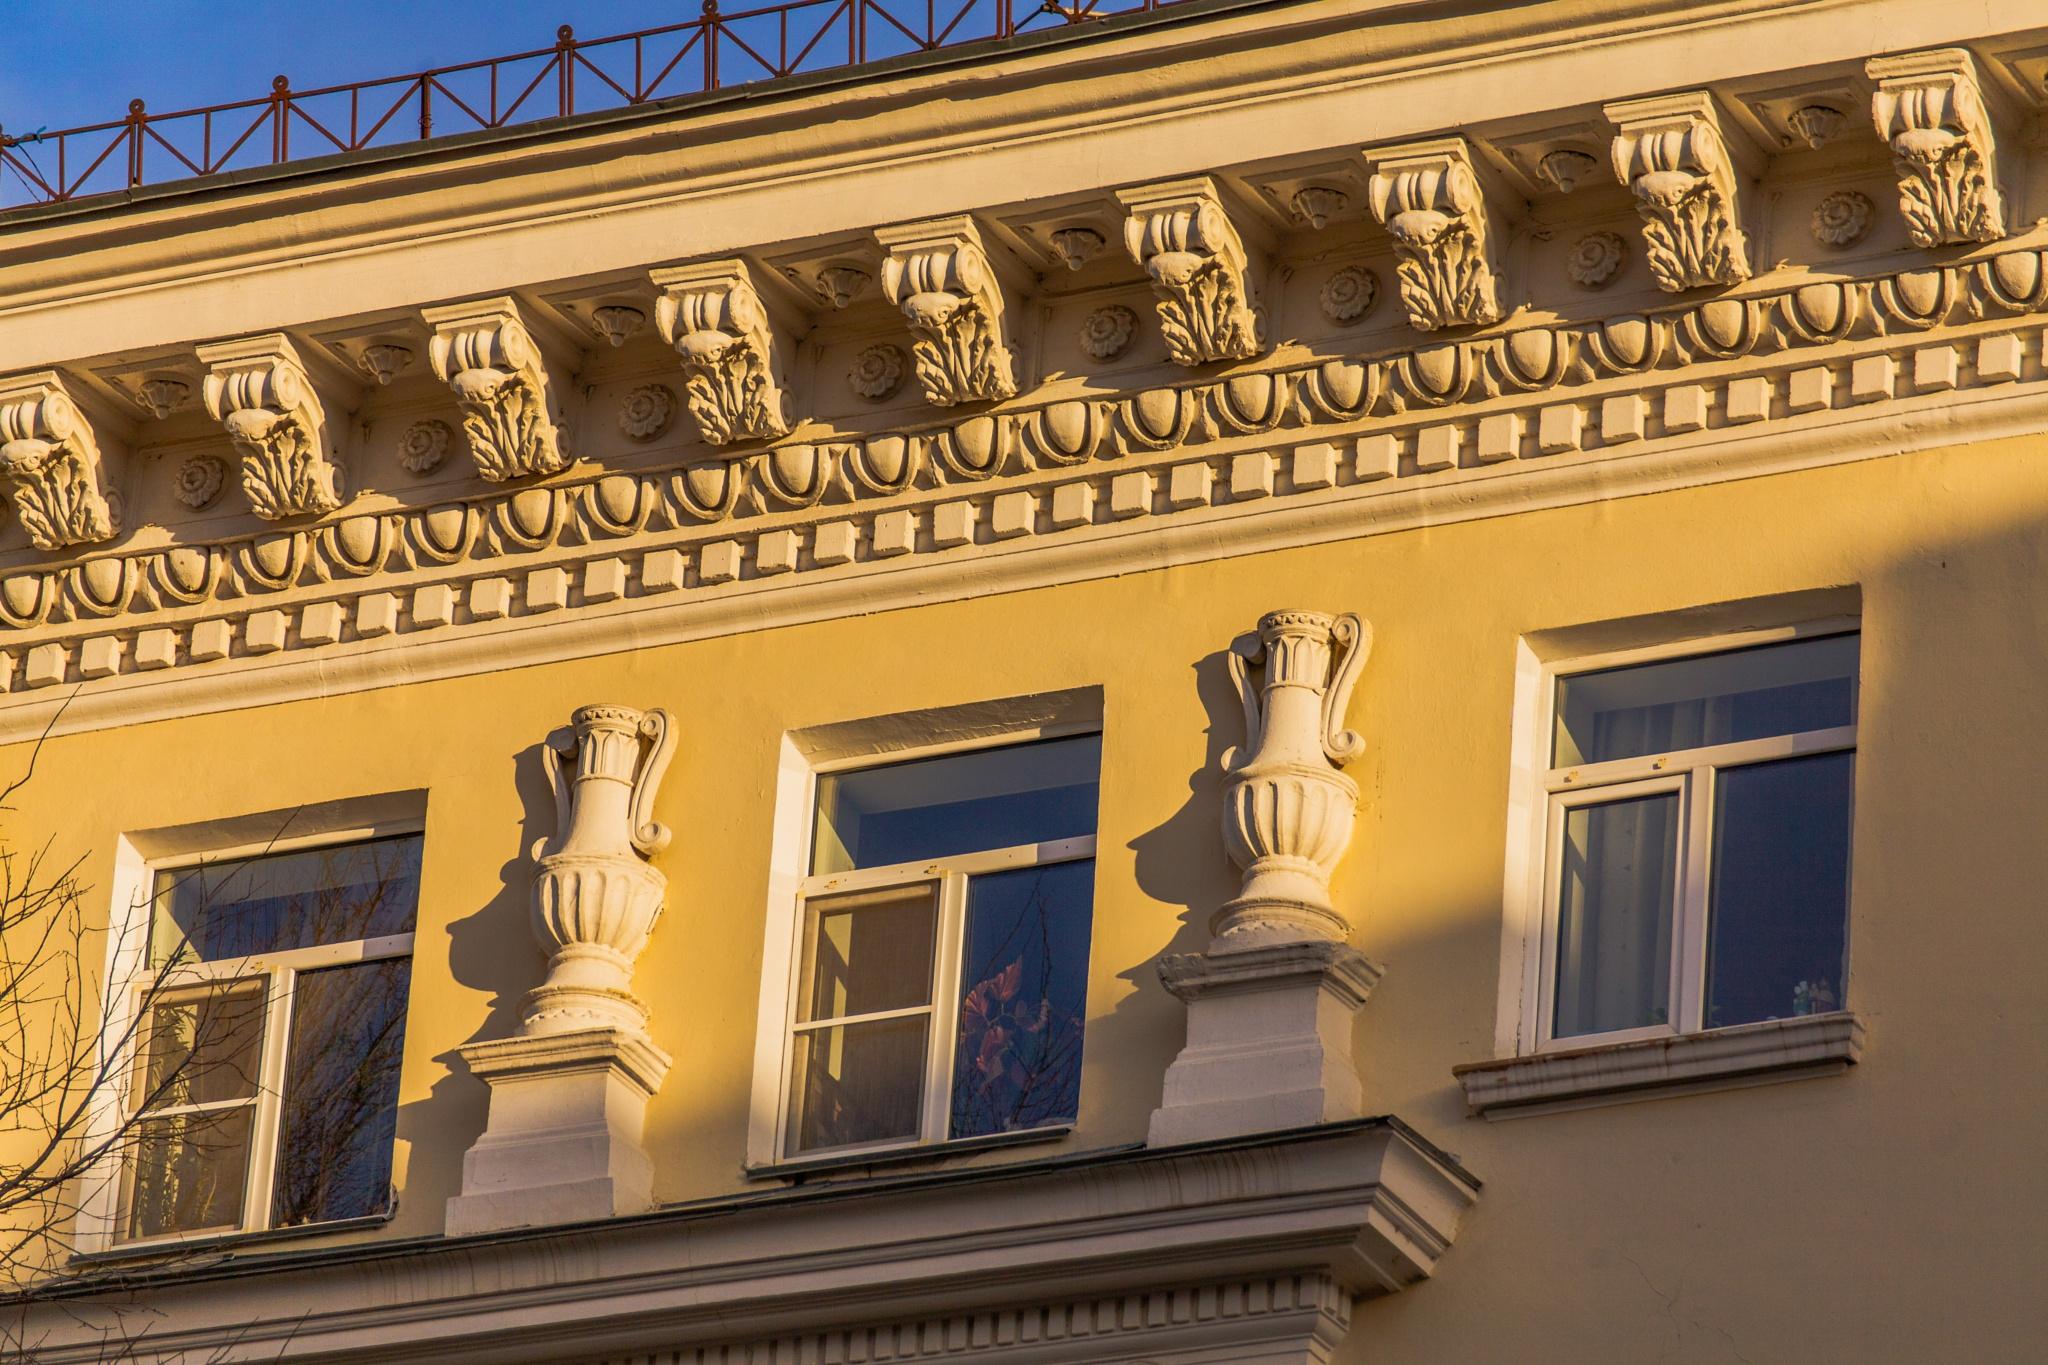 guard windows by OsA